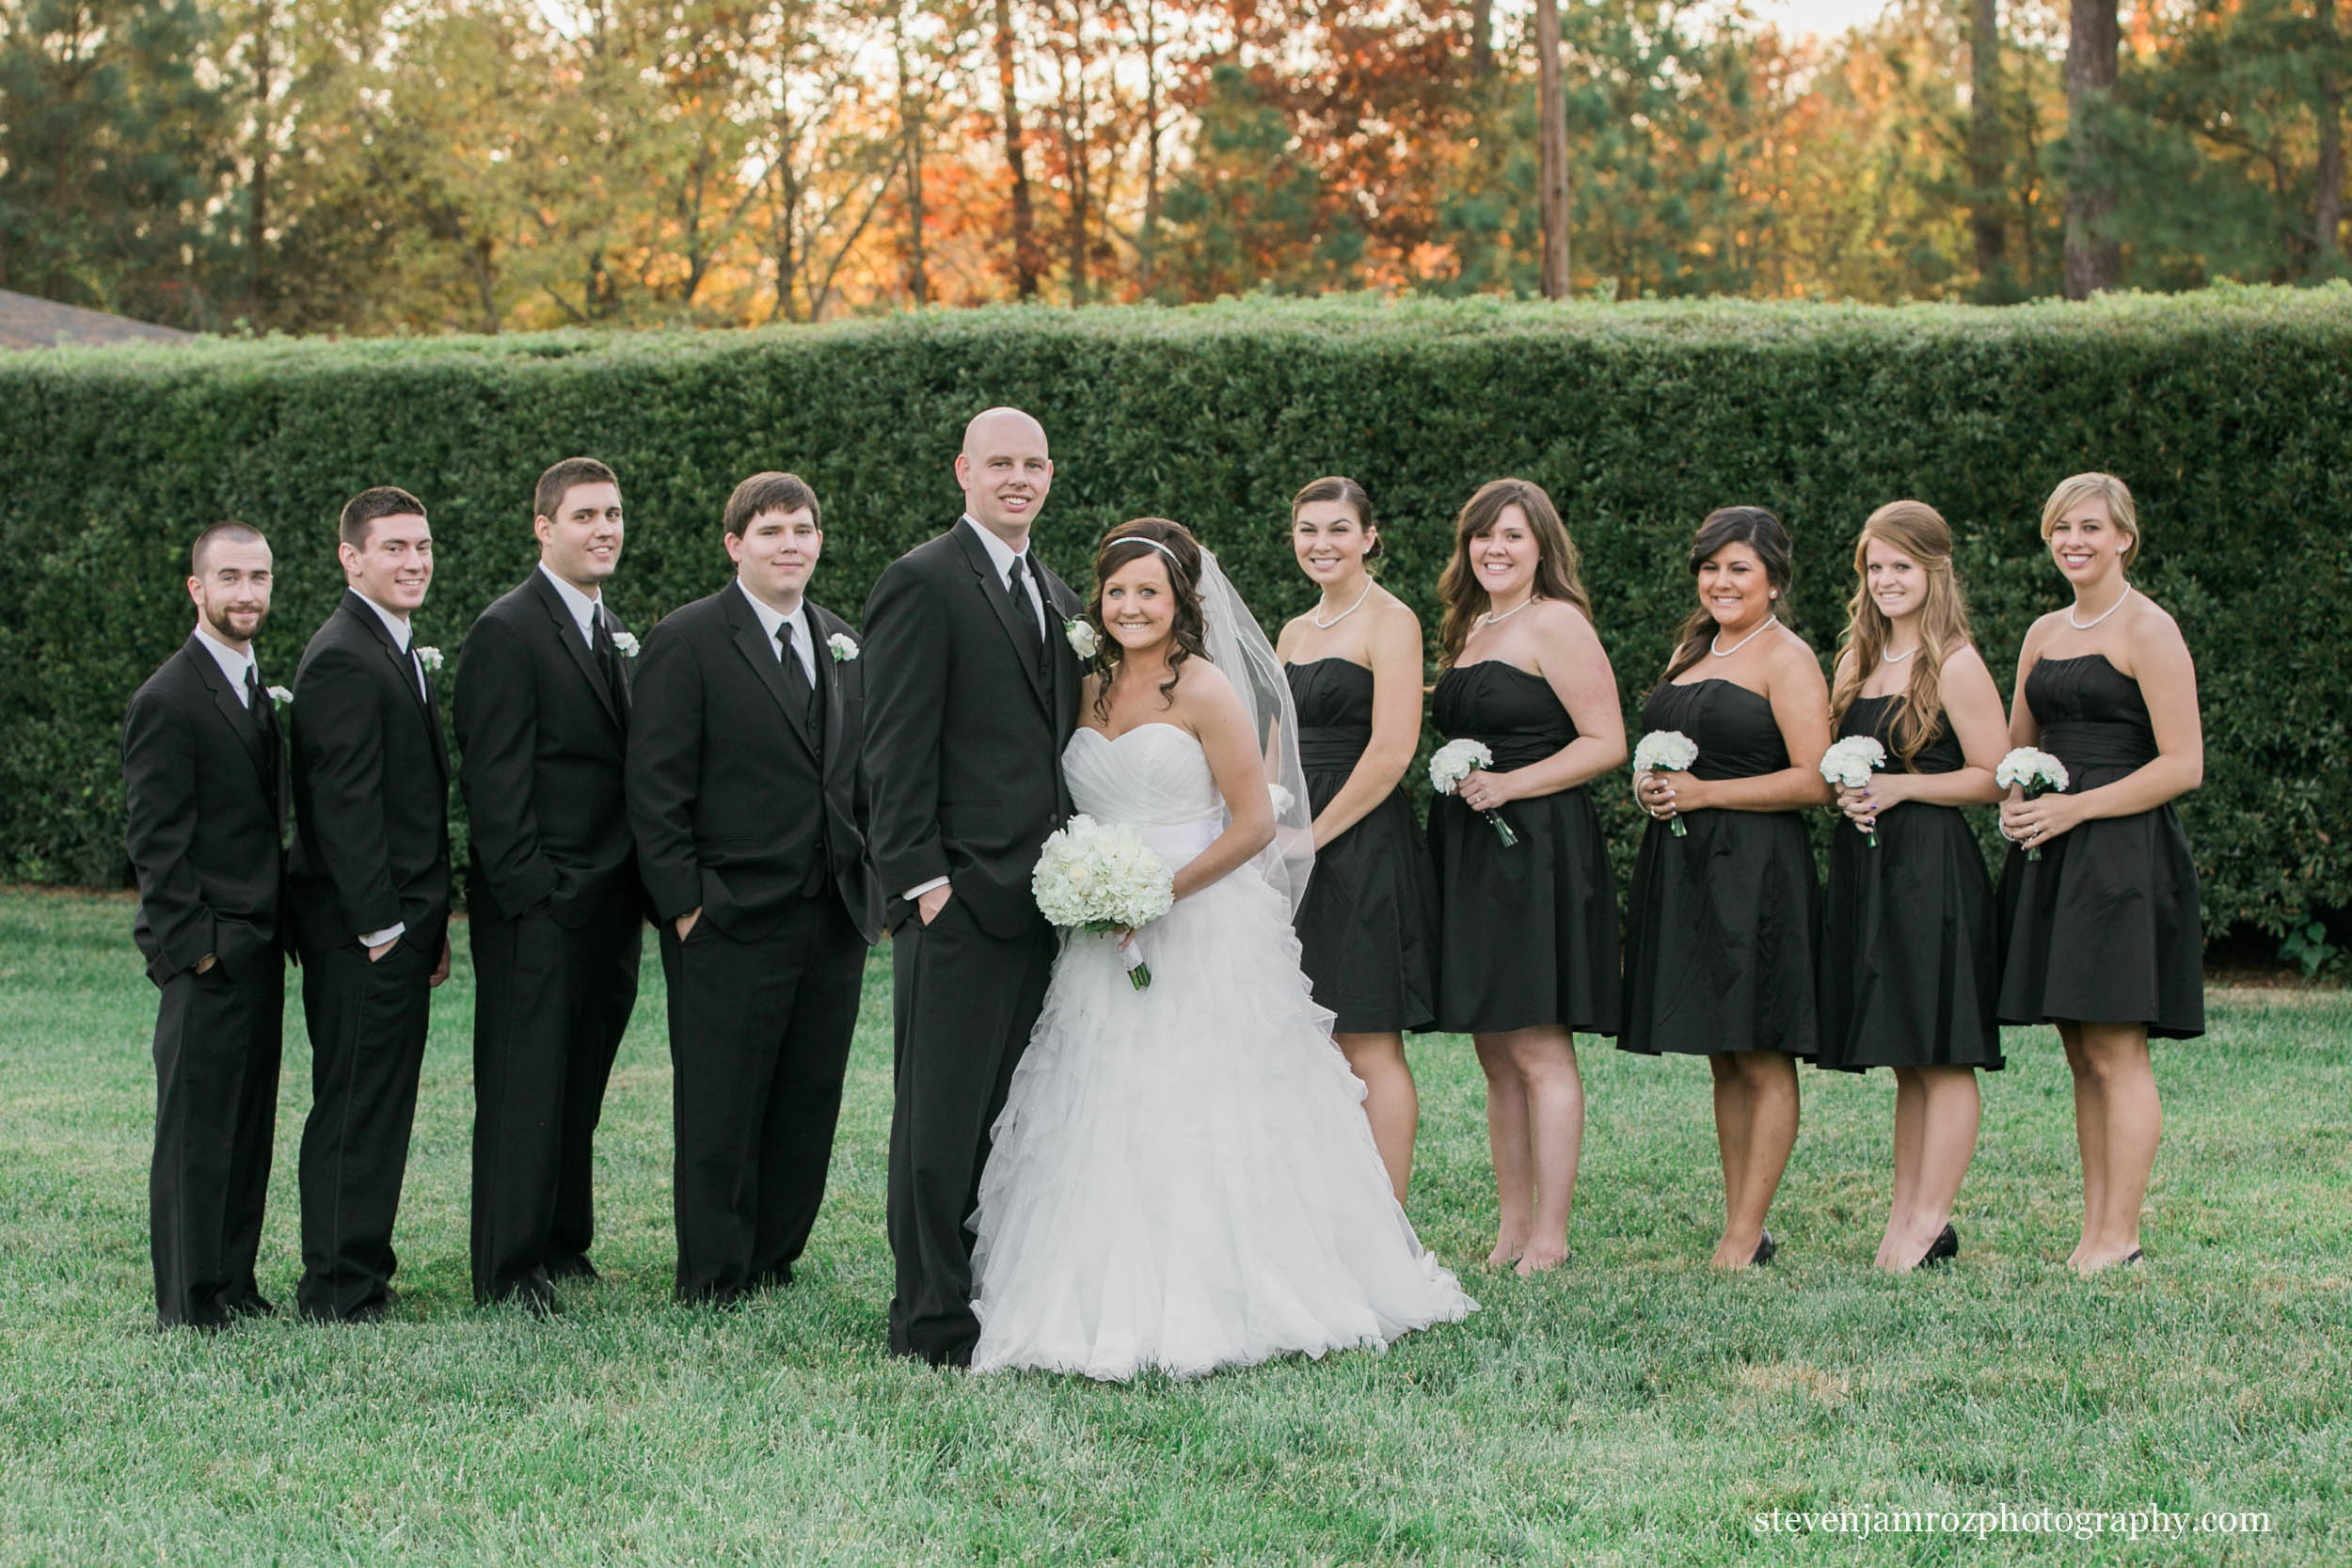 big-bridal-party-raleigh-wedding-steven-jamroz-photography-0493.jpg